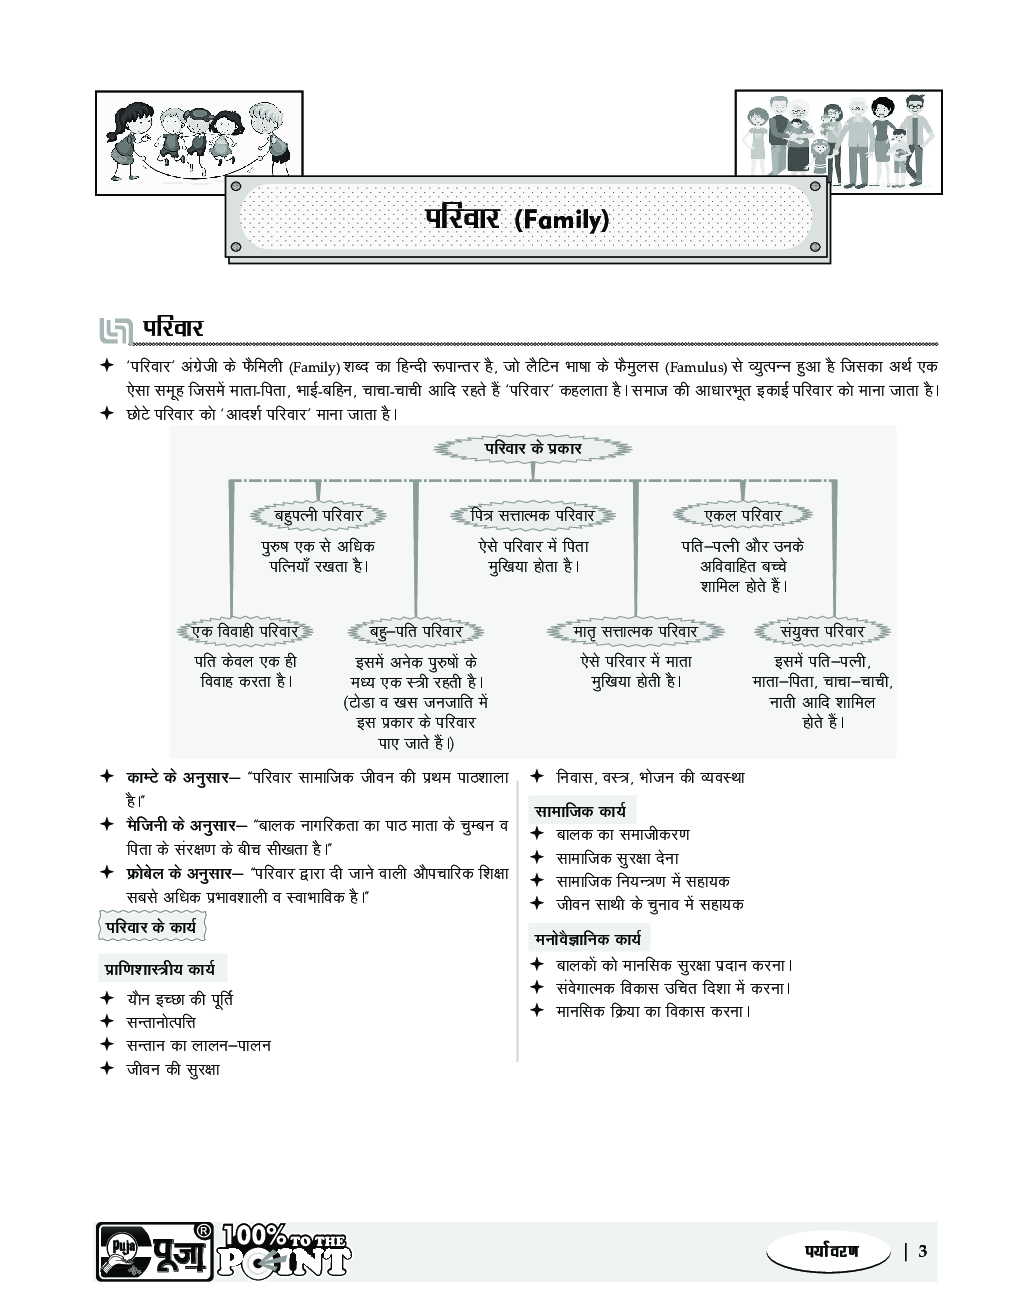 Puja पर्यावरण अध्ययन (CTET & TETs) - Page 5